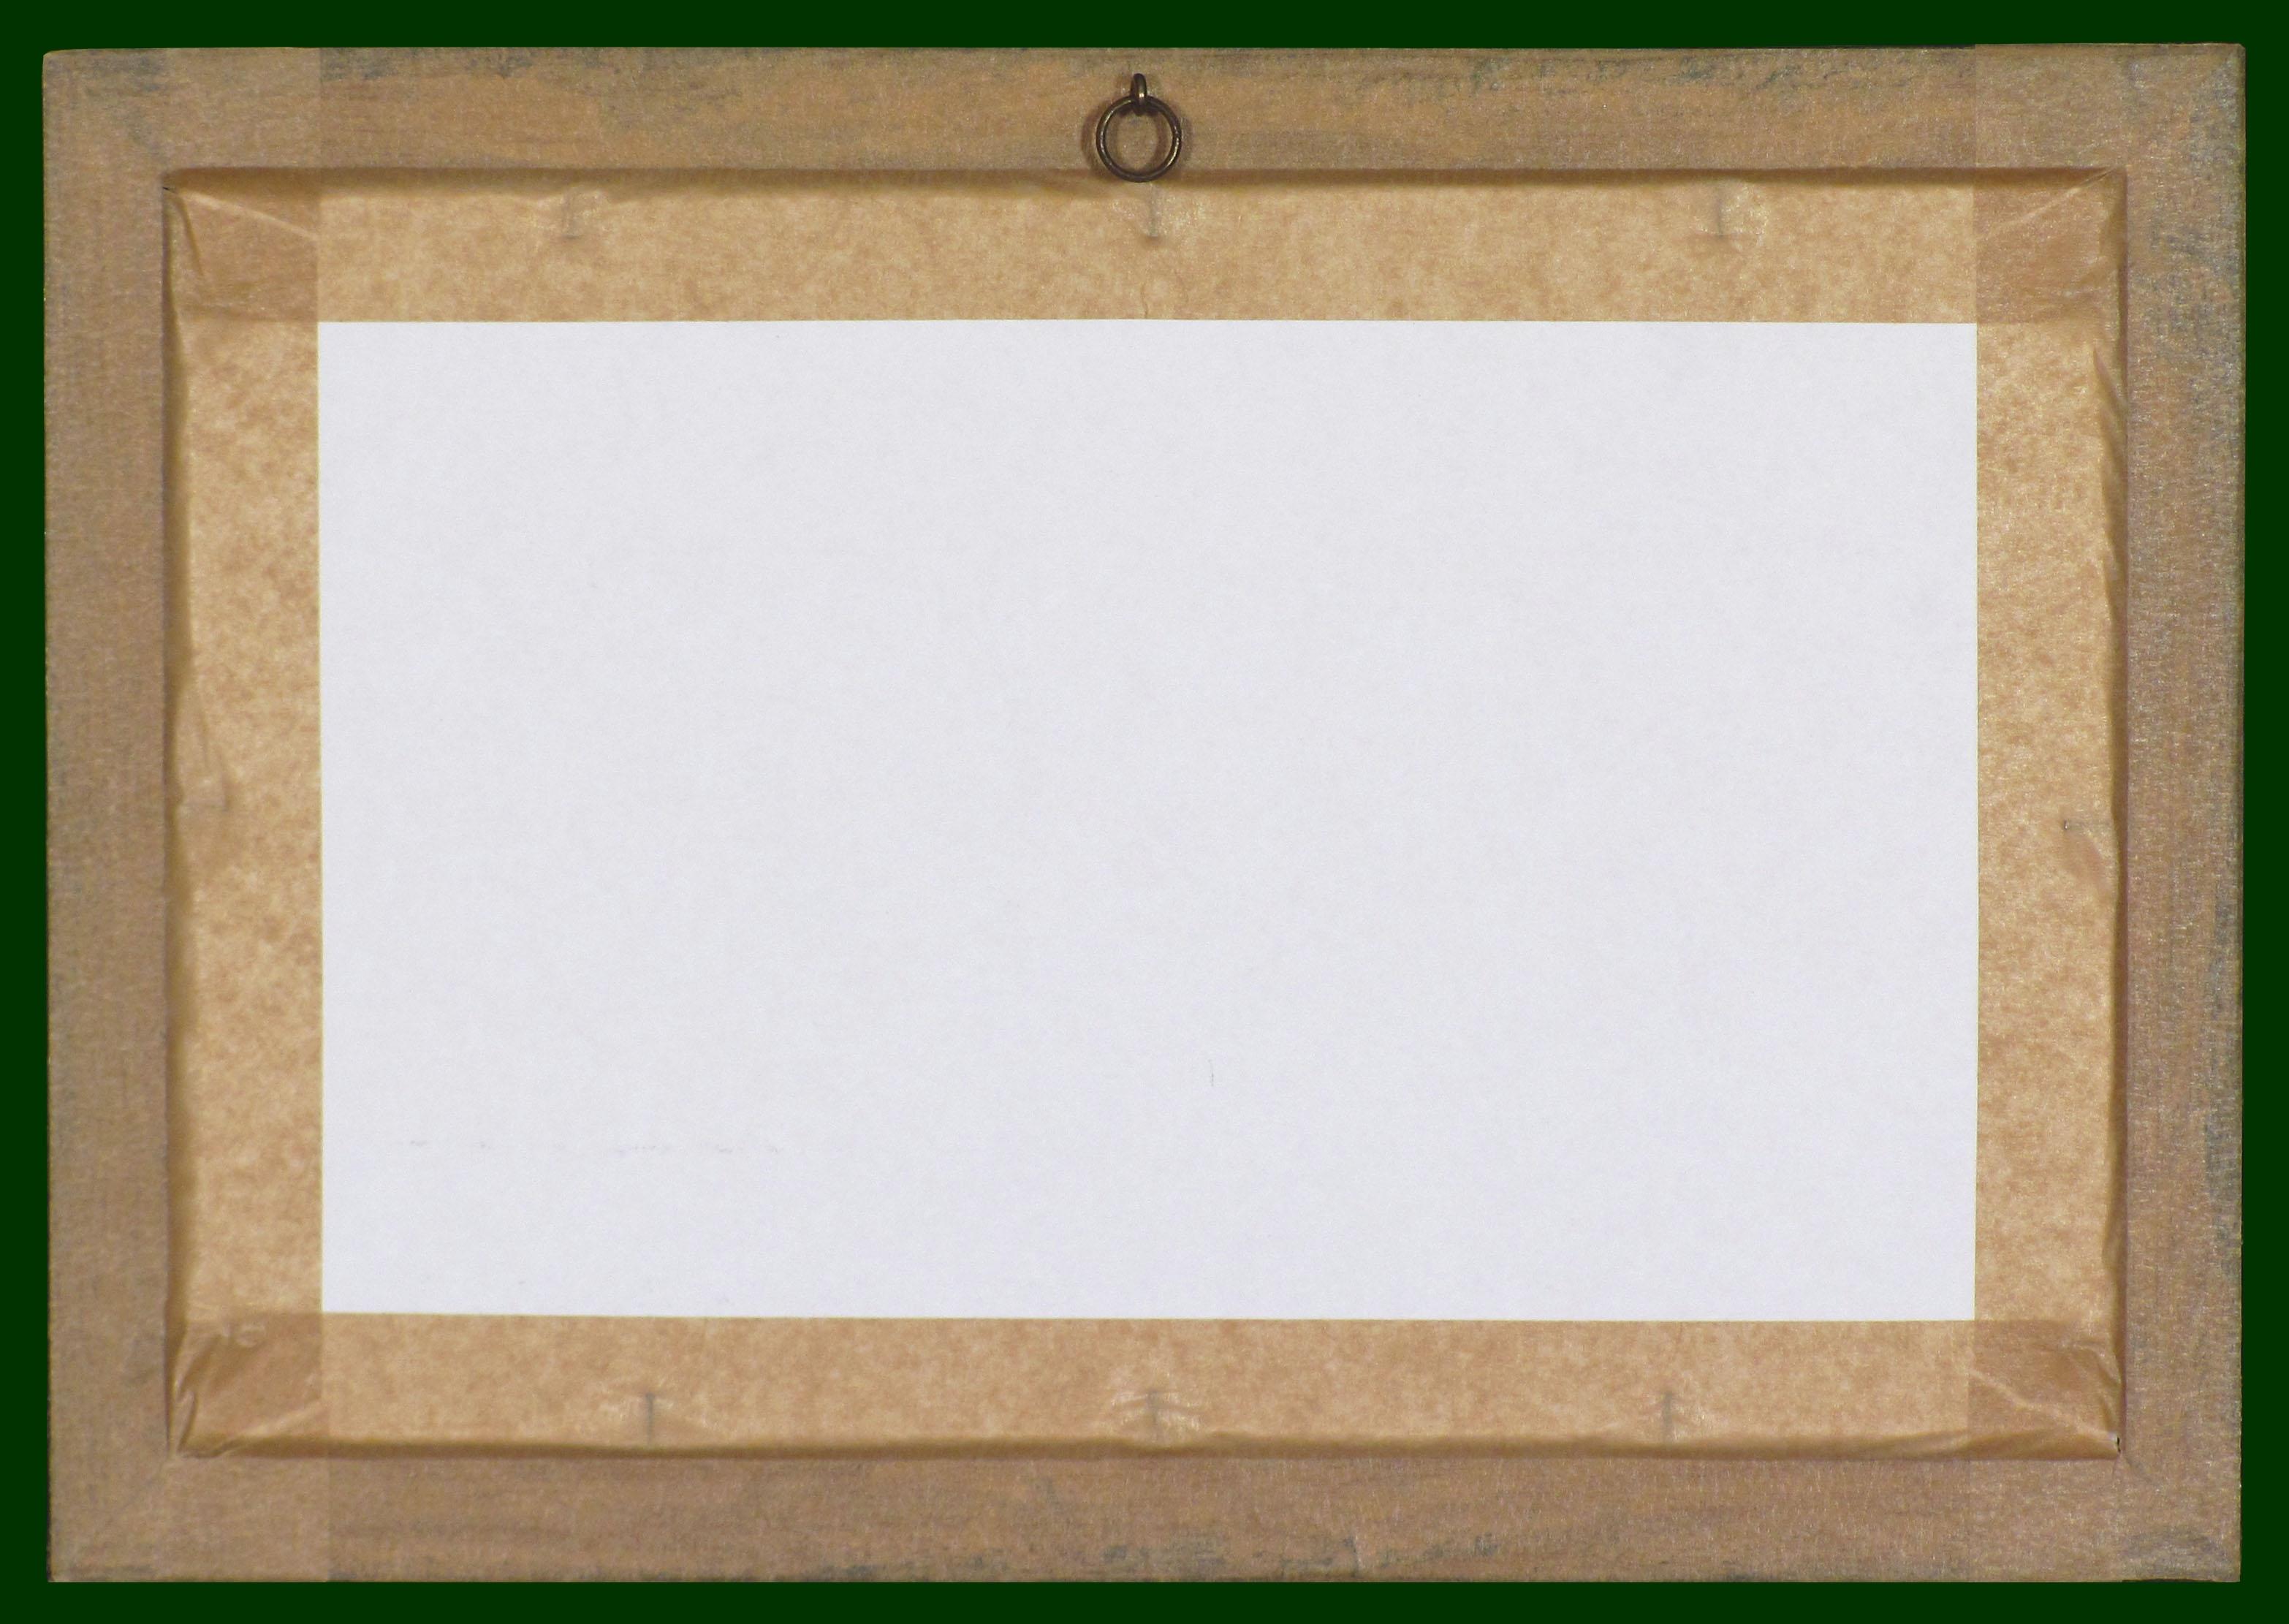 95-9hát.jpg (3132×2222)